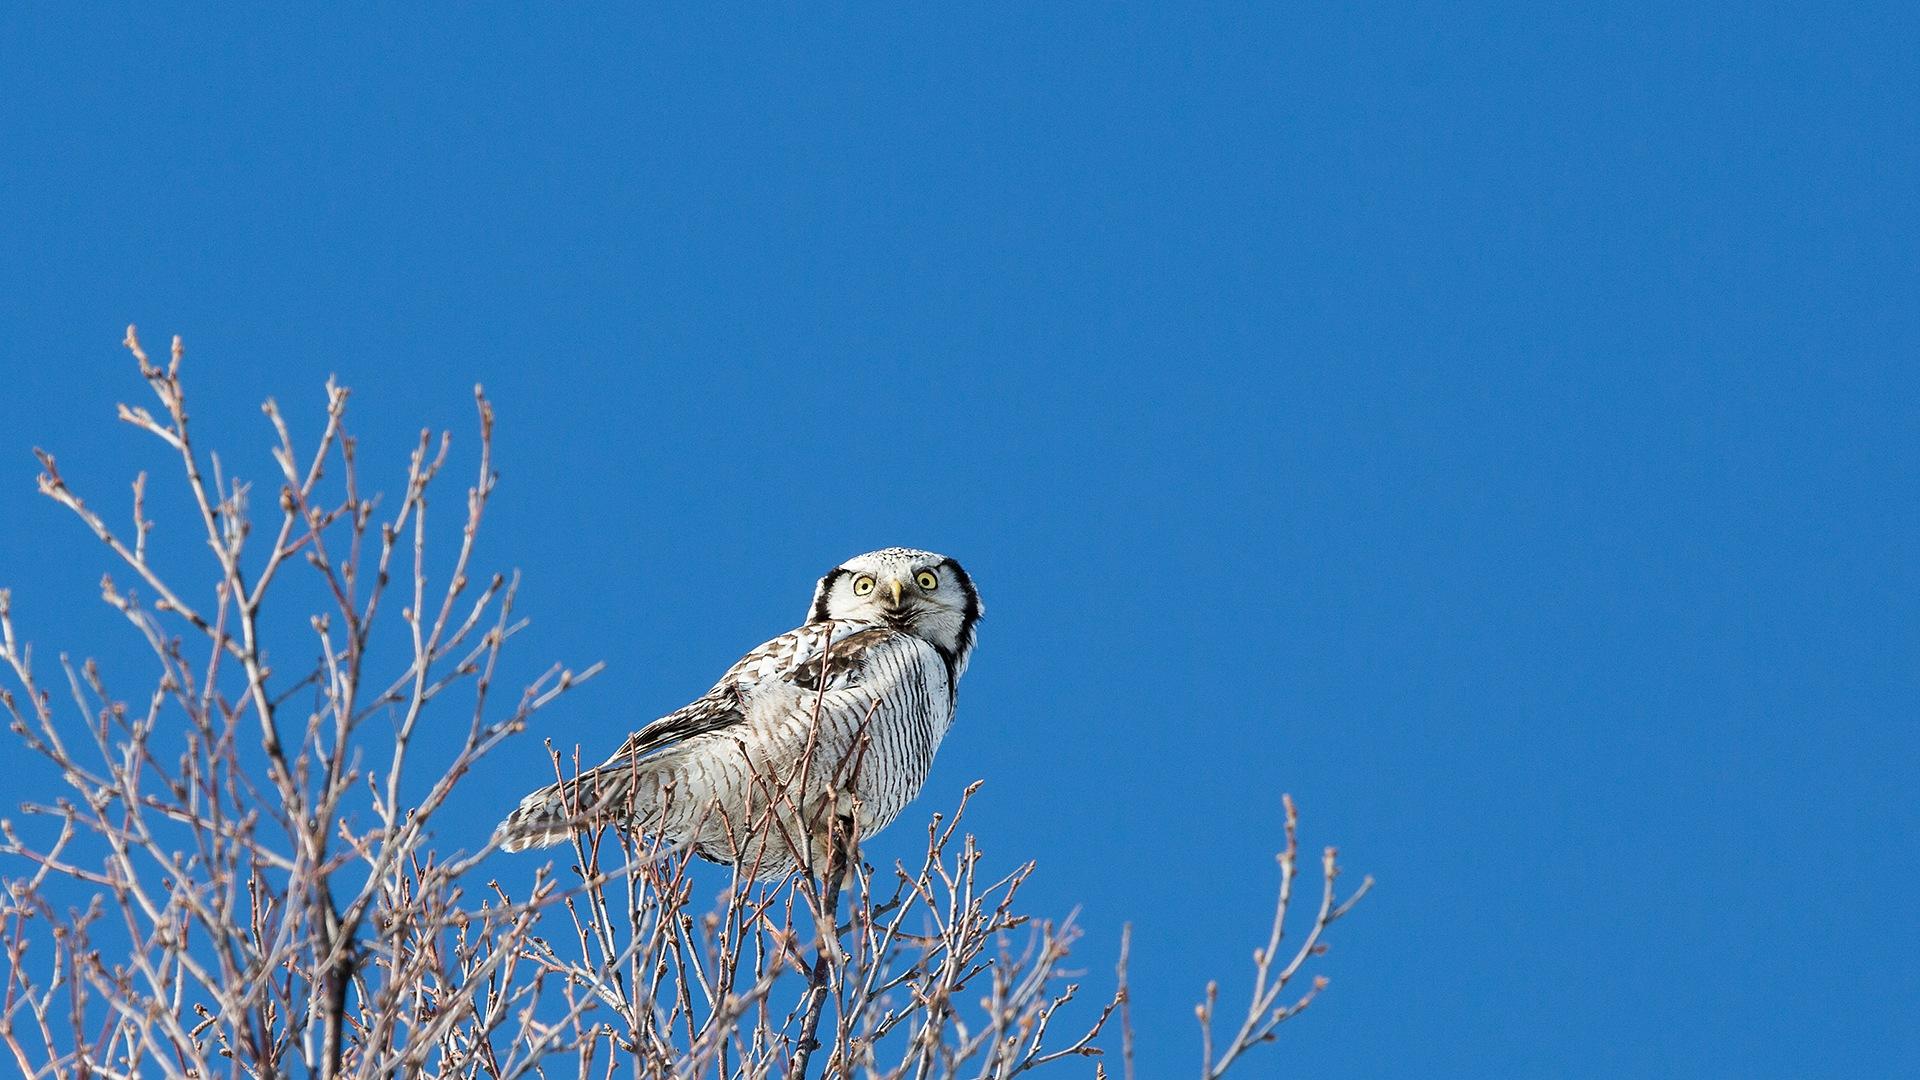 Hawk Owl by Ronny Grytbakk